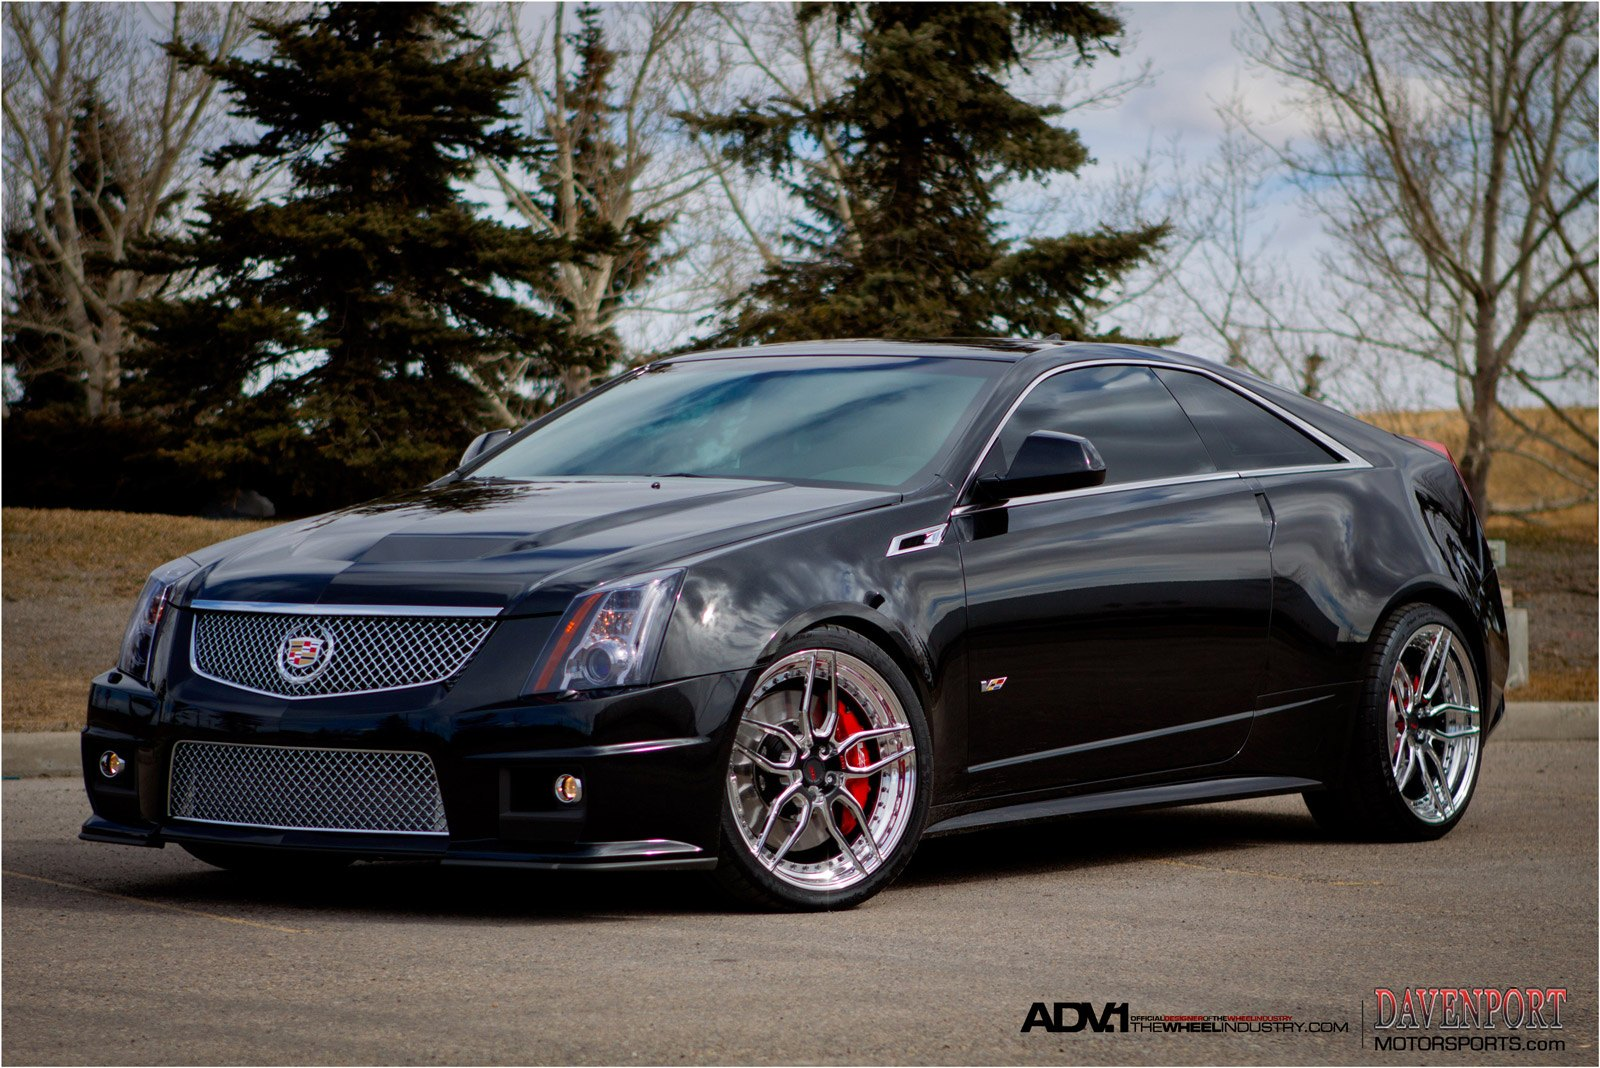 Mirror Polished Modular Adv1 Rims On Black Cadillac Cts V Coupe